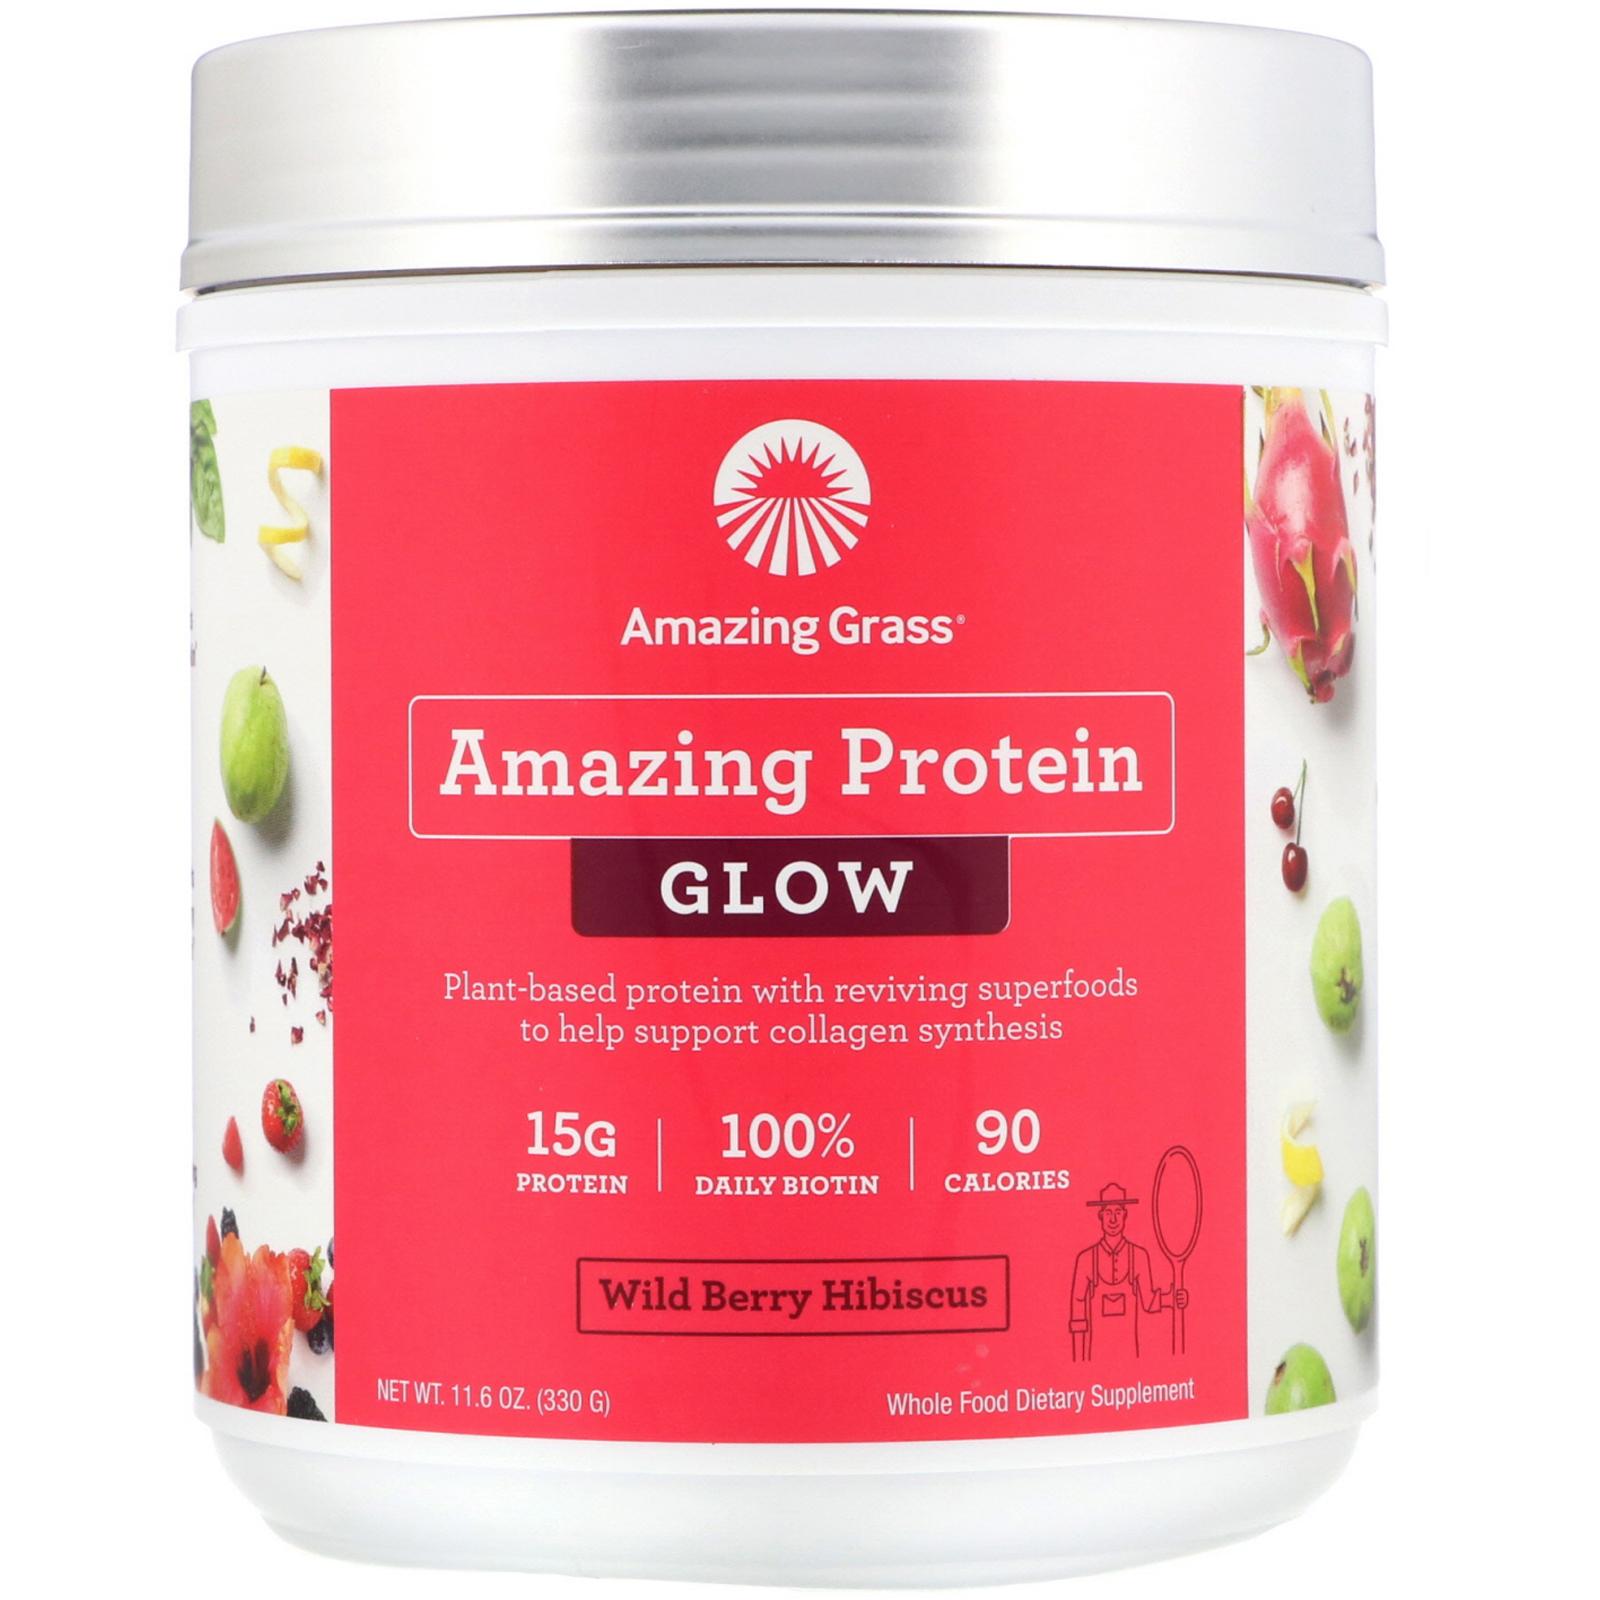 Amazing Grass Amazing Protein Glow Wild Berry Hibiscus 116 Oz